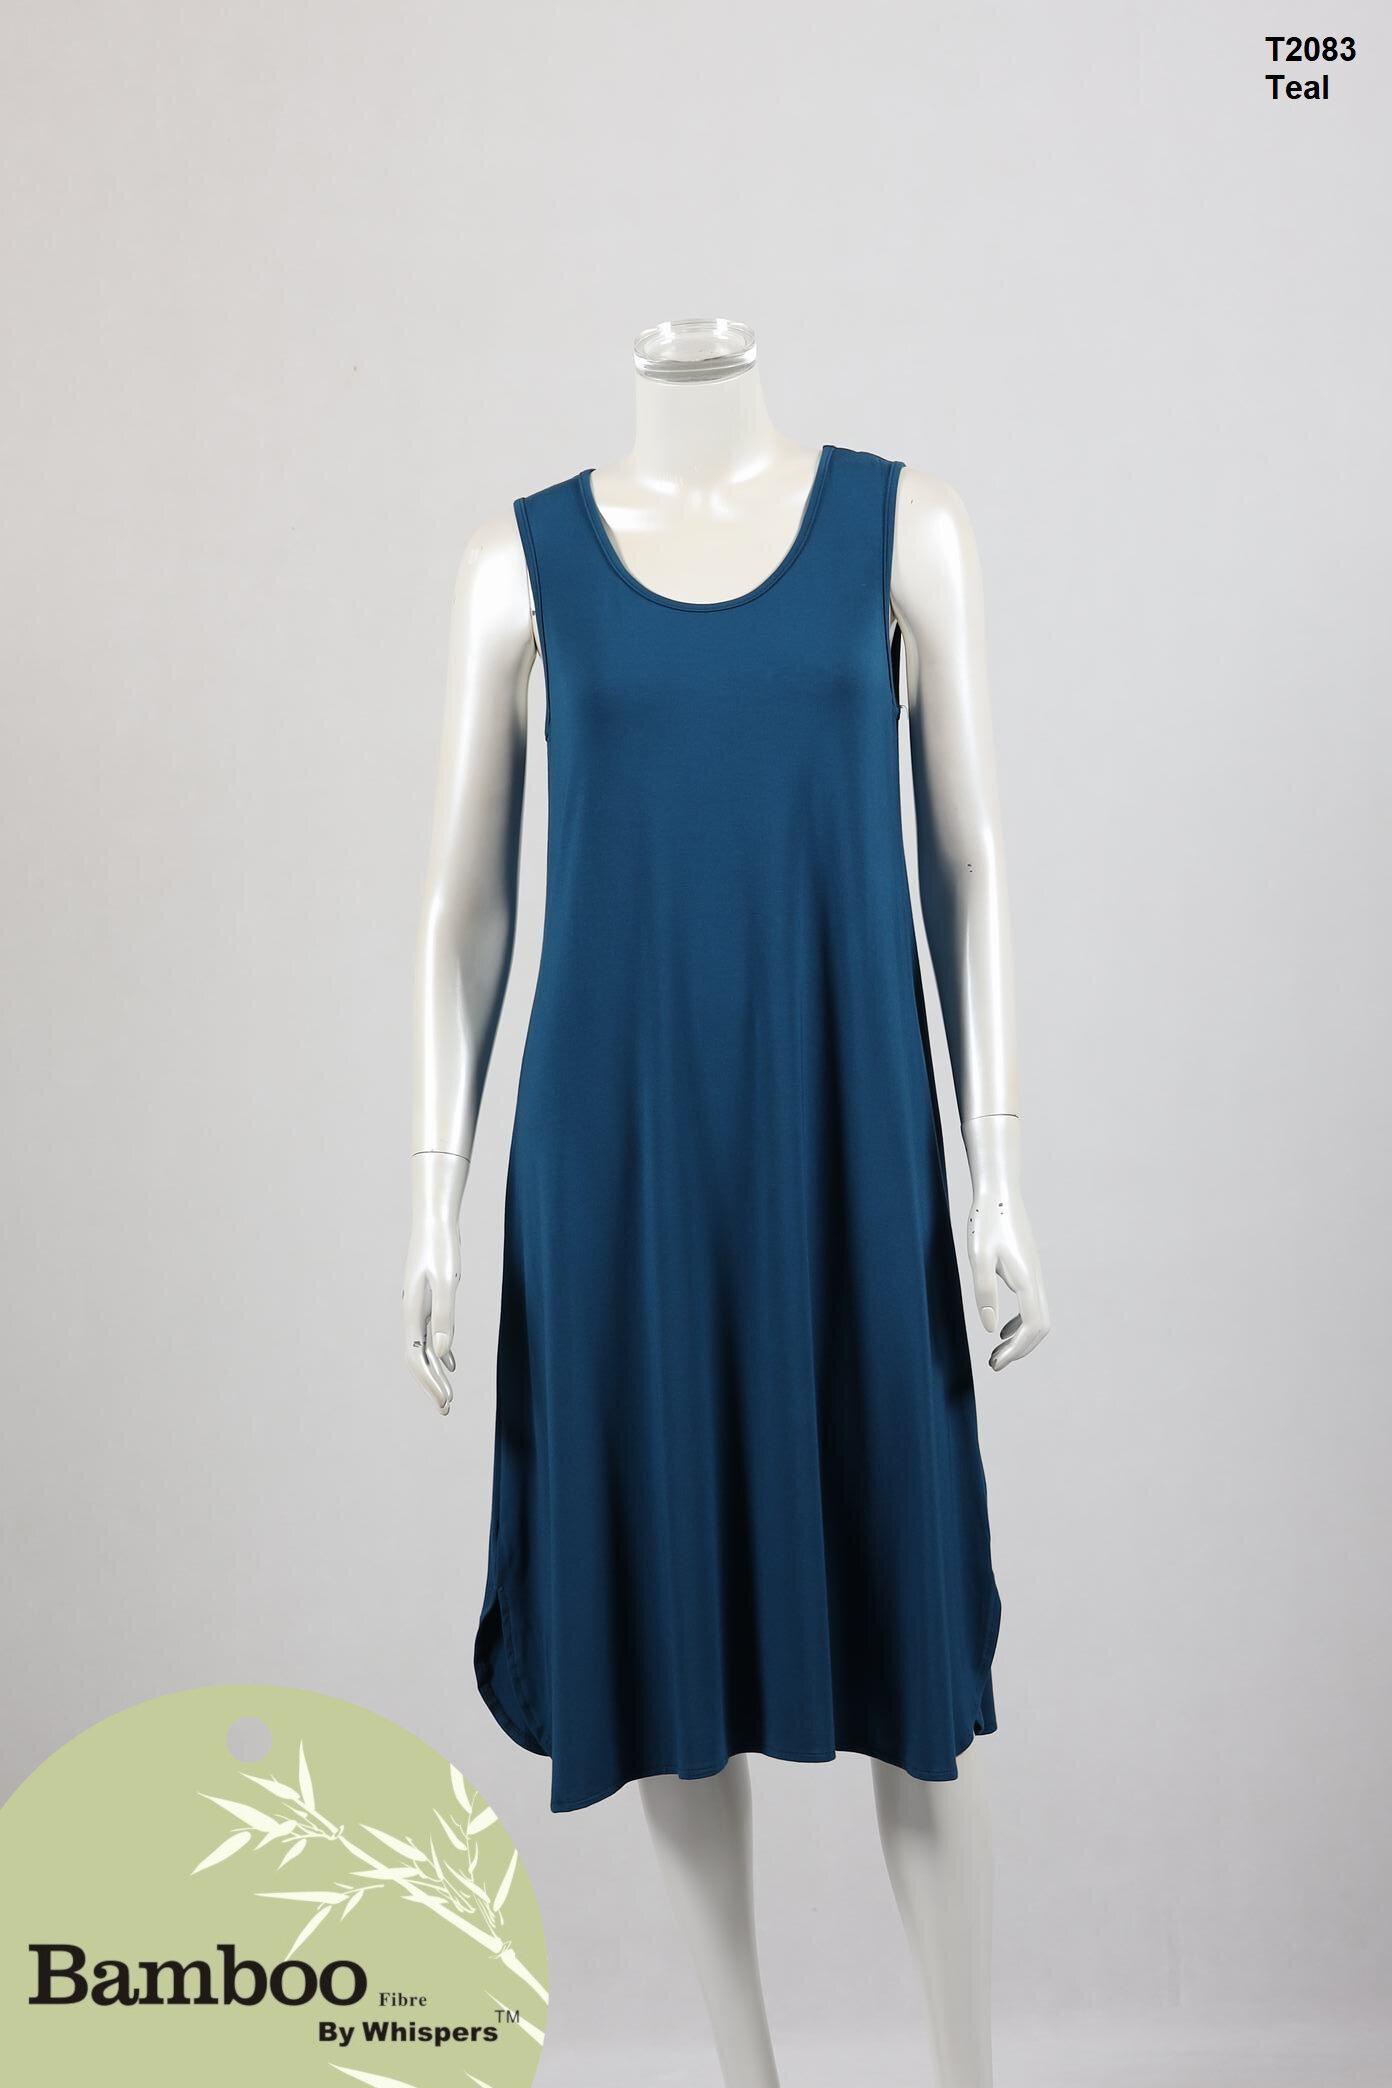 T2083-Bamboo Dress-Teal.JPG